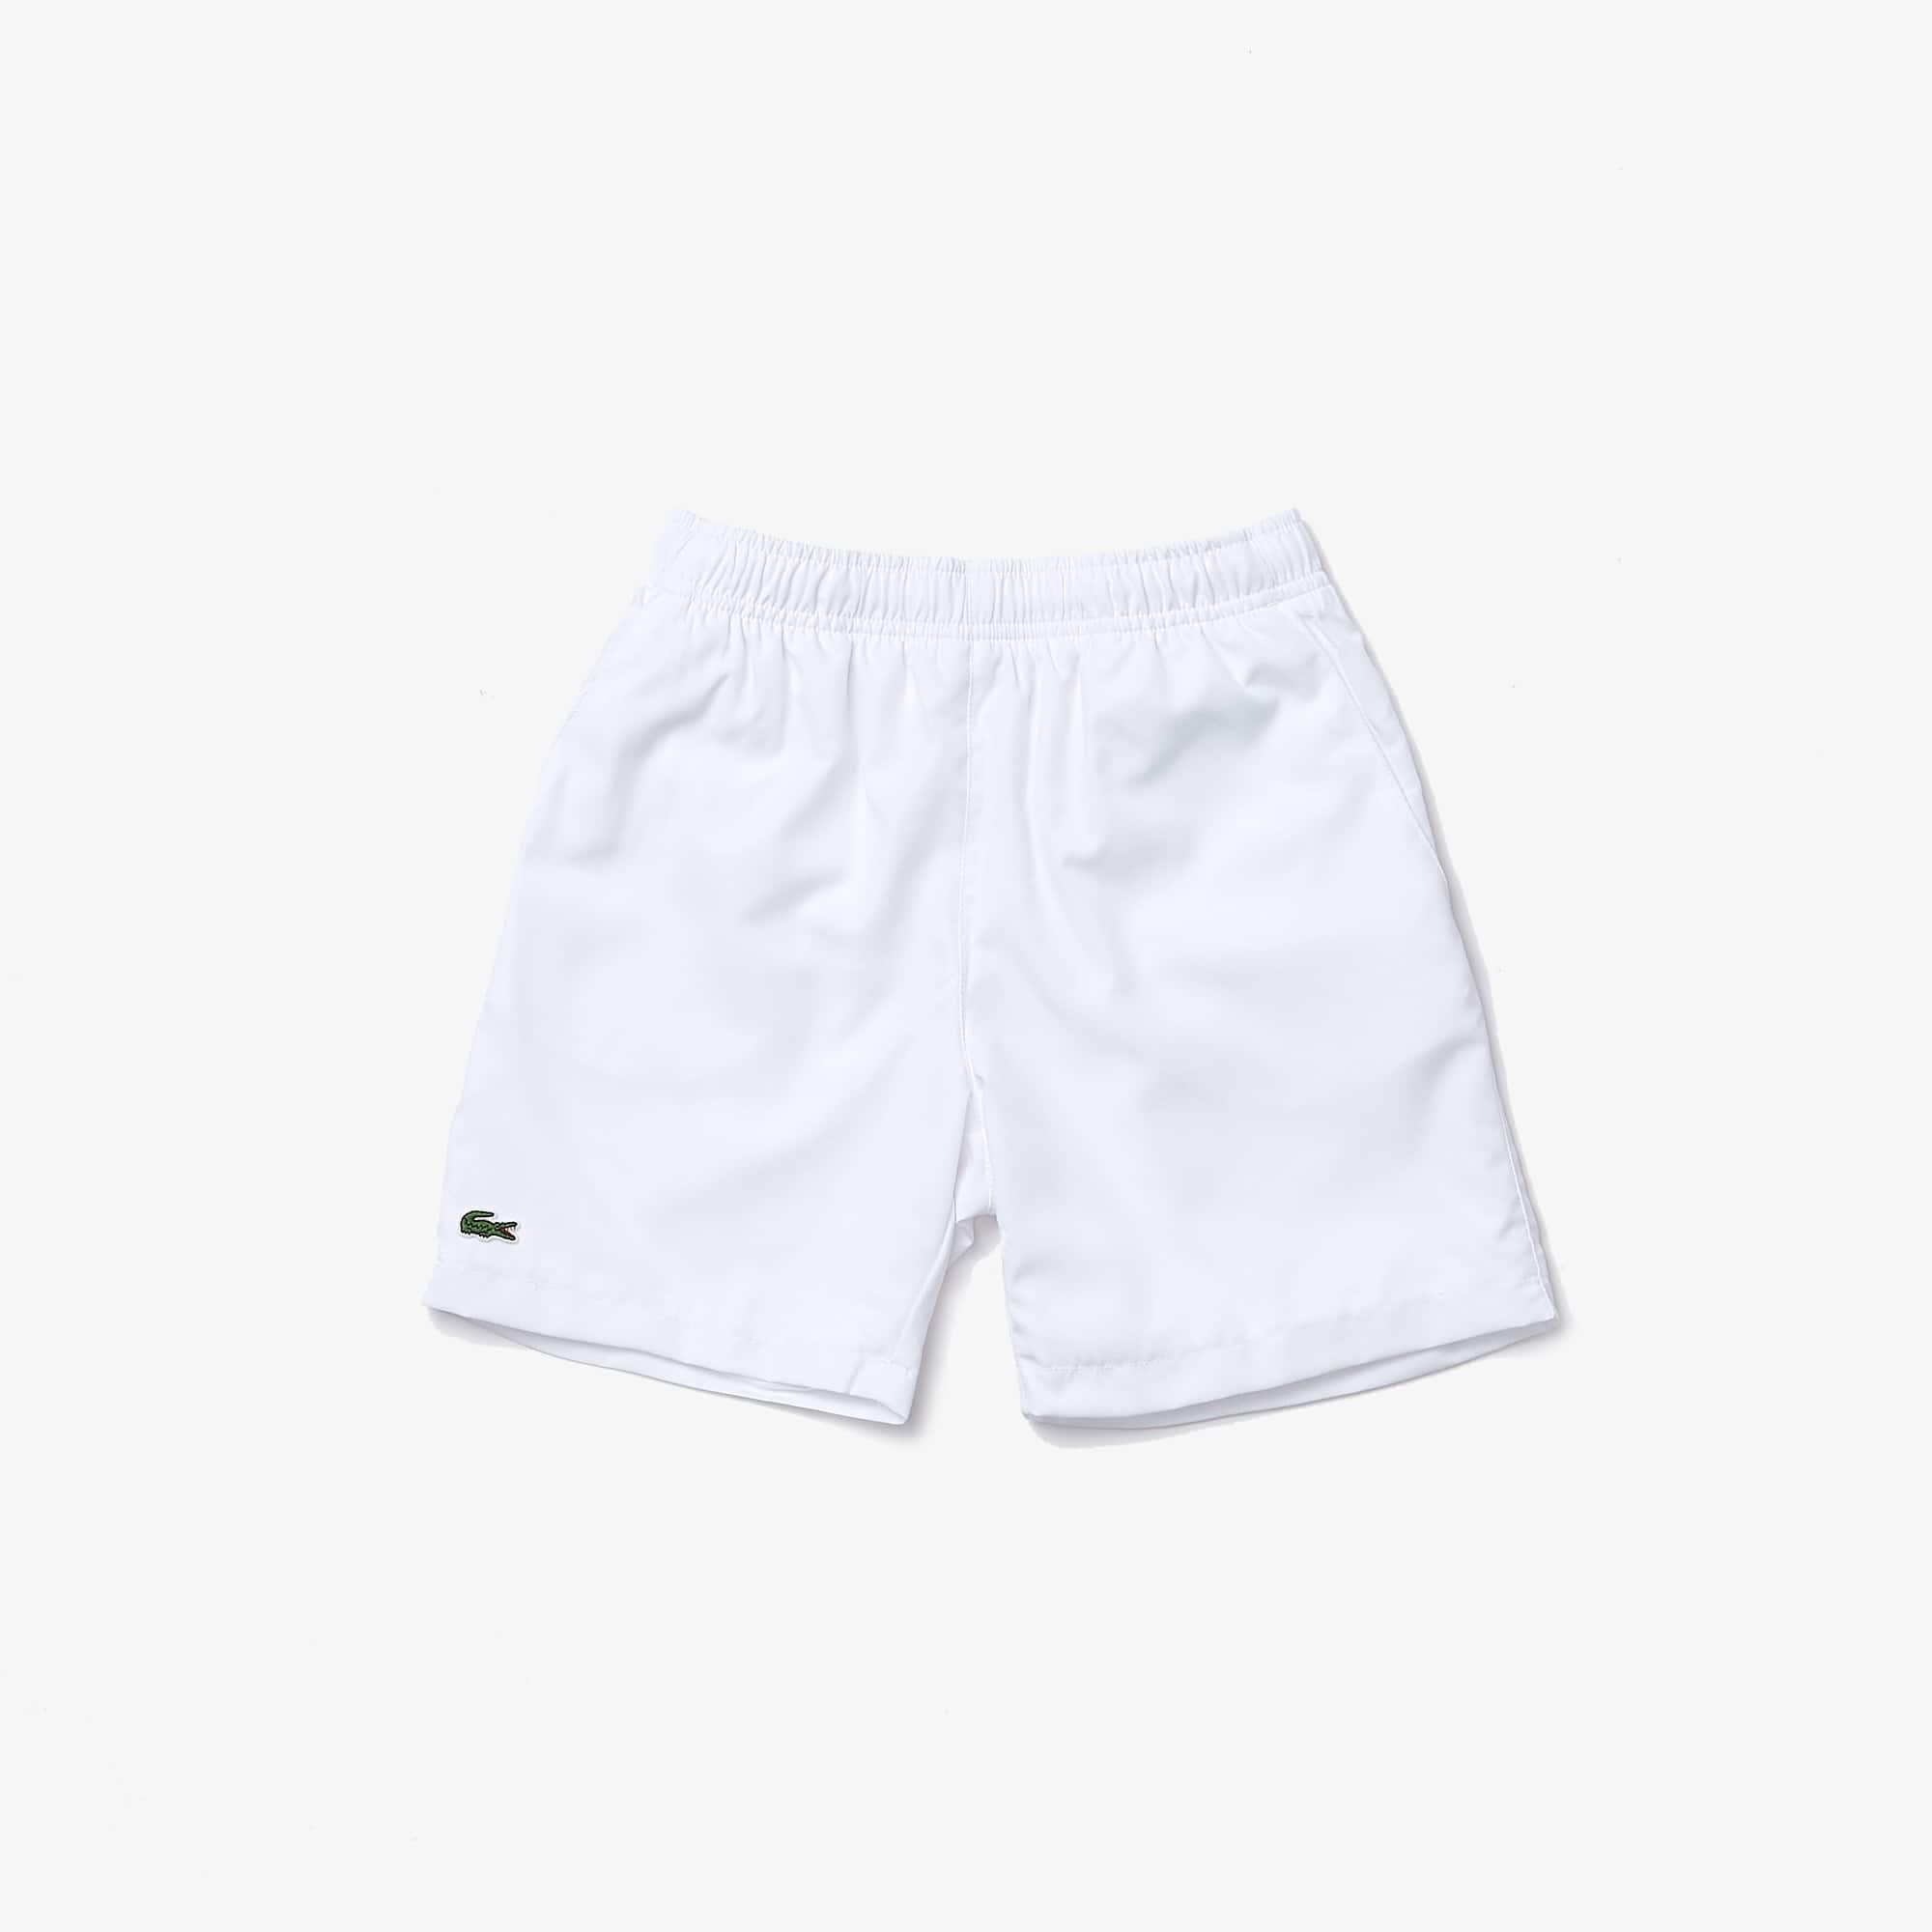 Short Garçon Tennis Lacoste SPORT uni